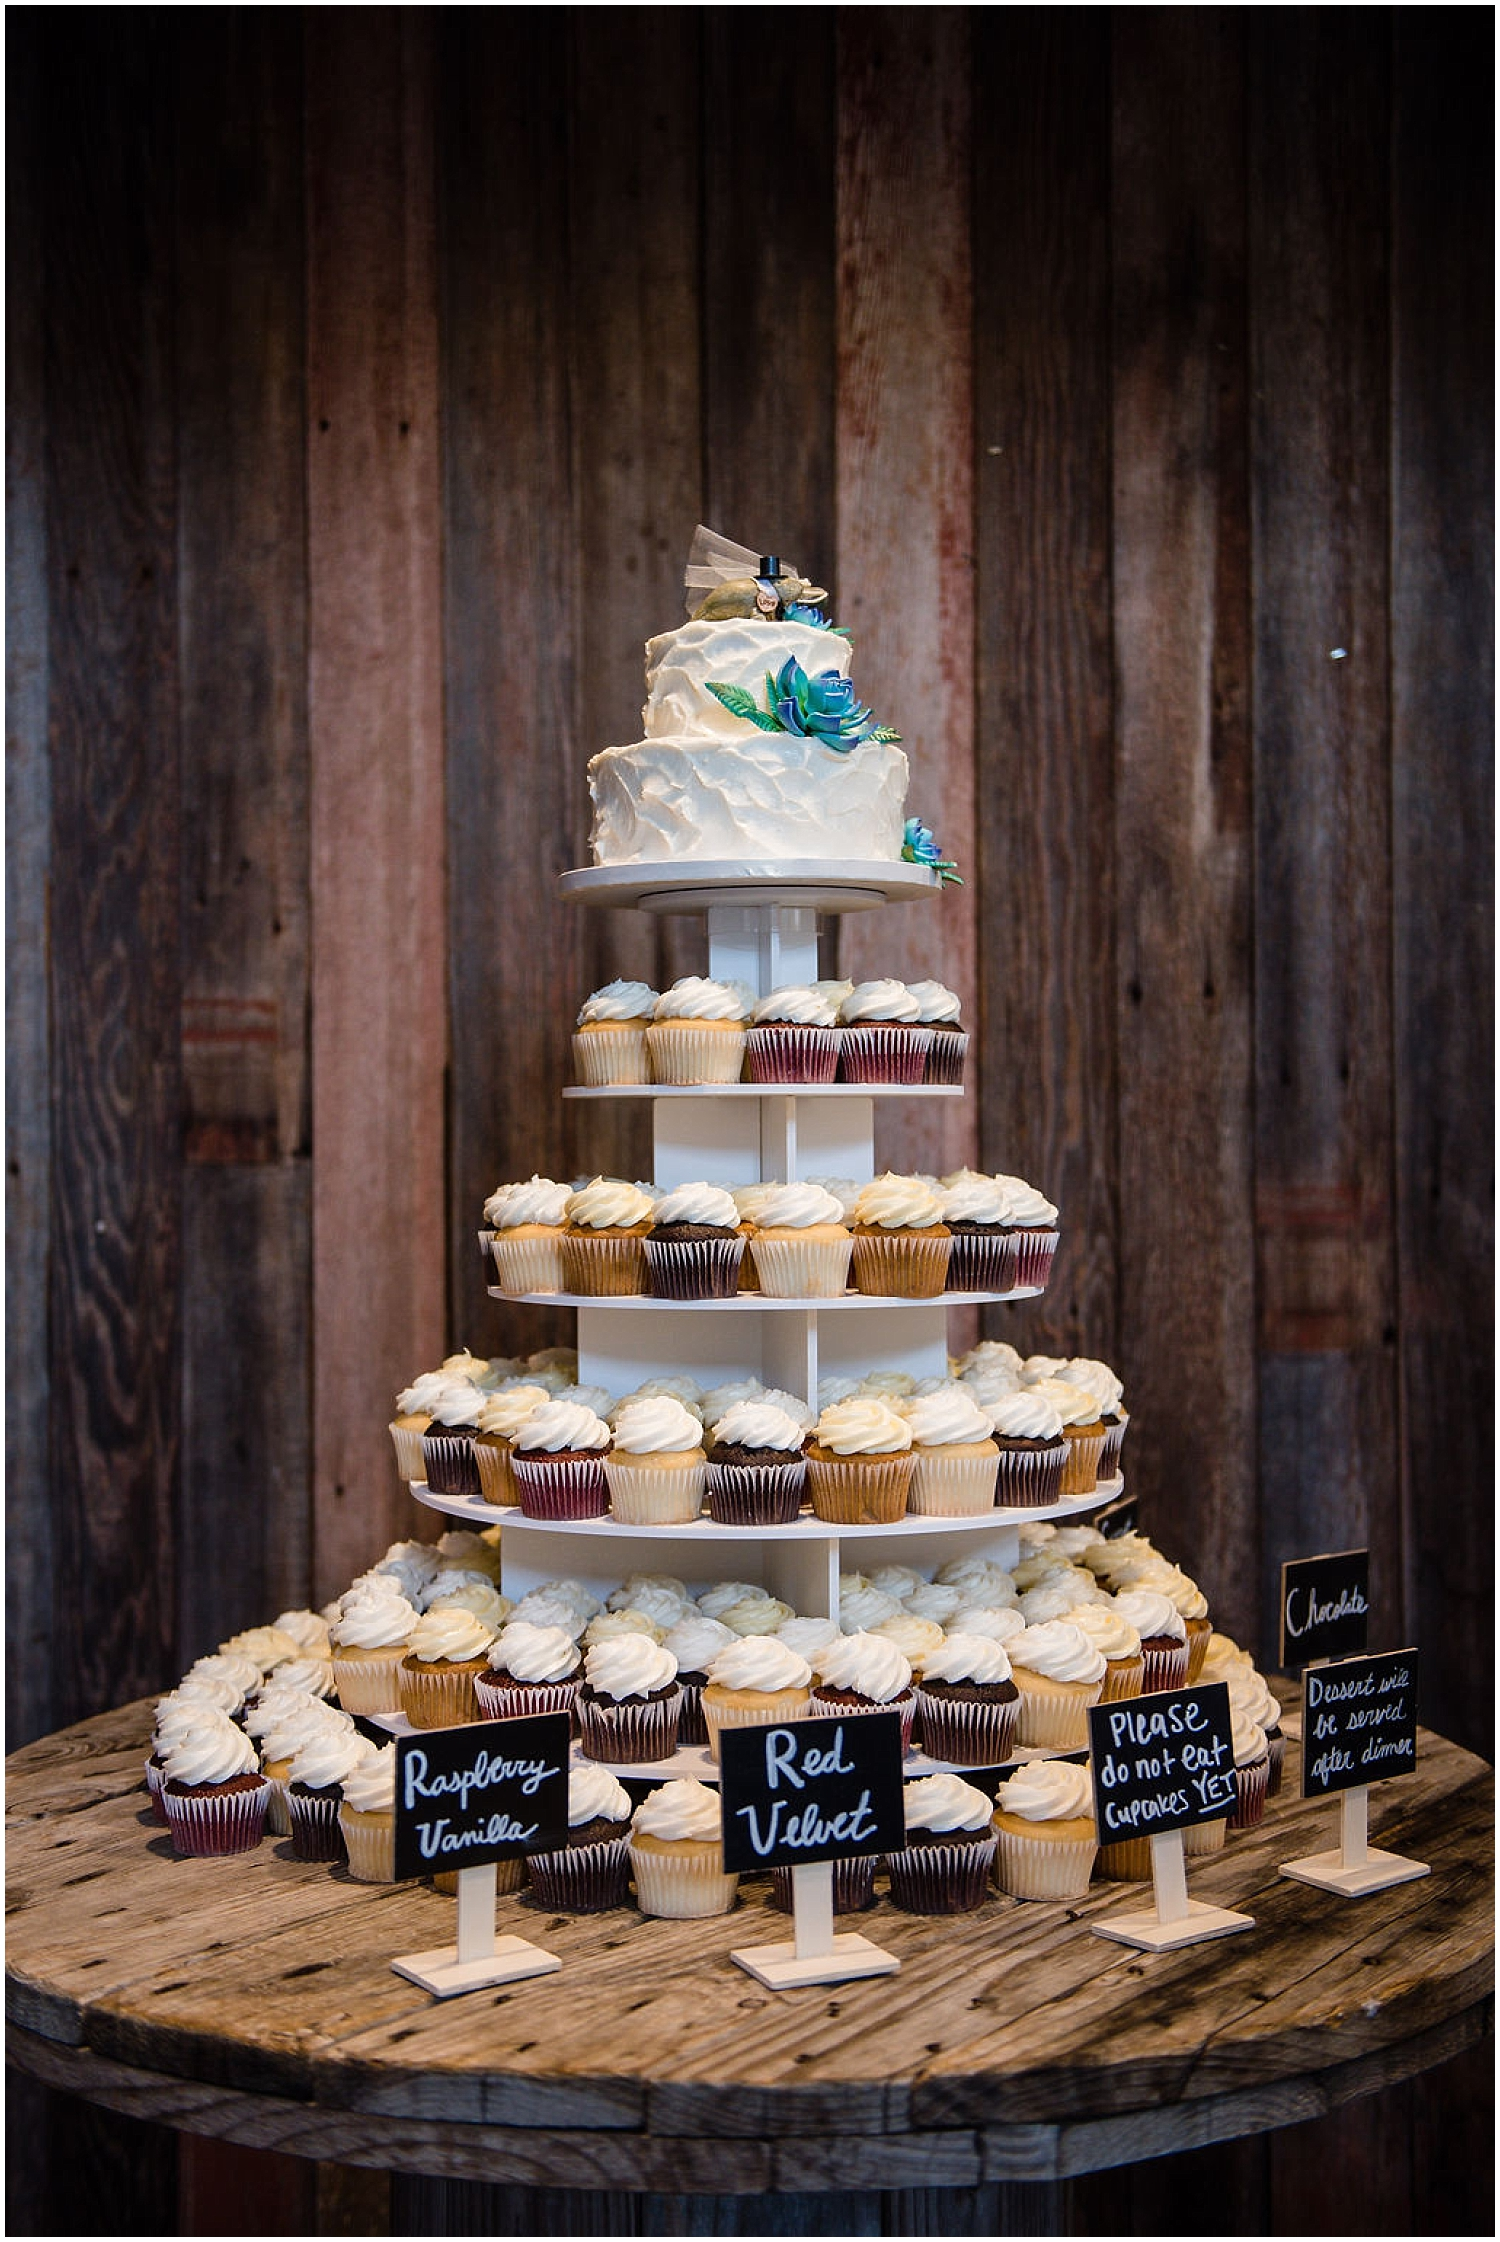 cake and dessert table display